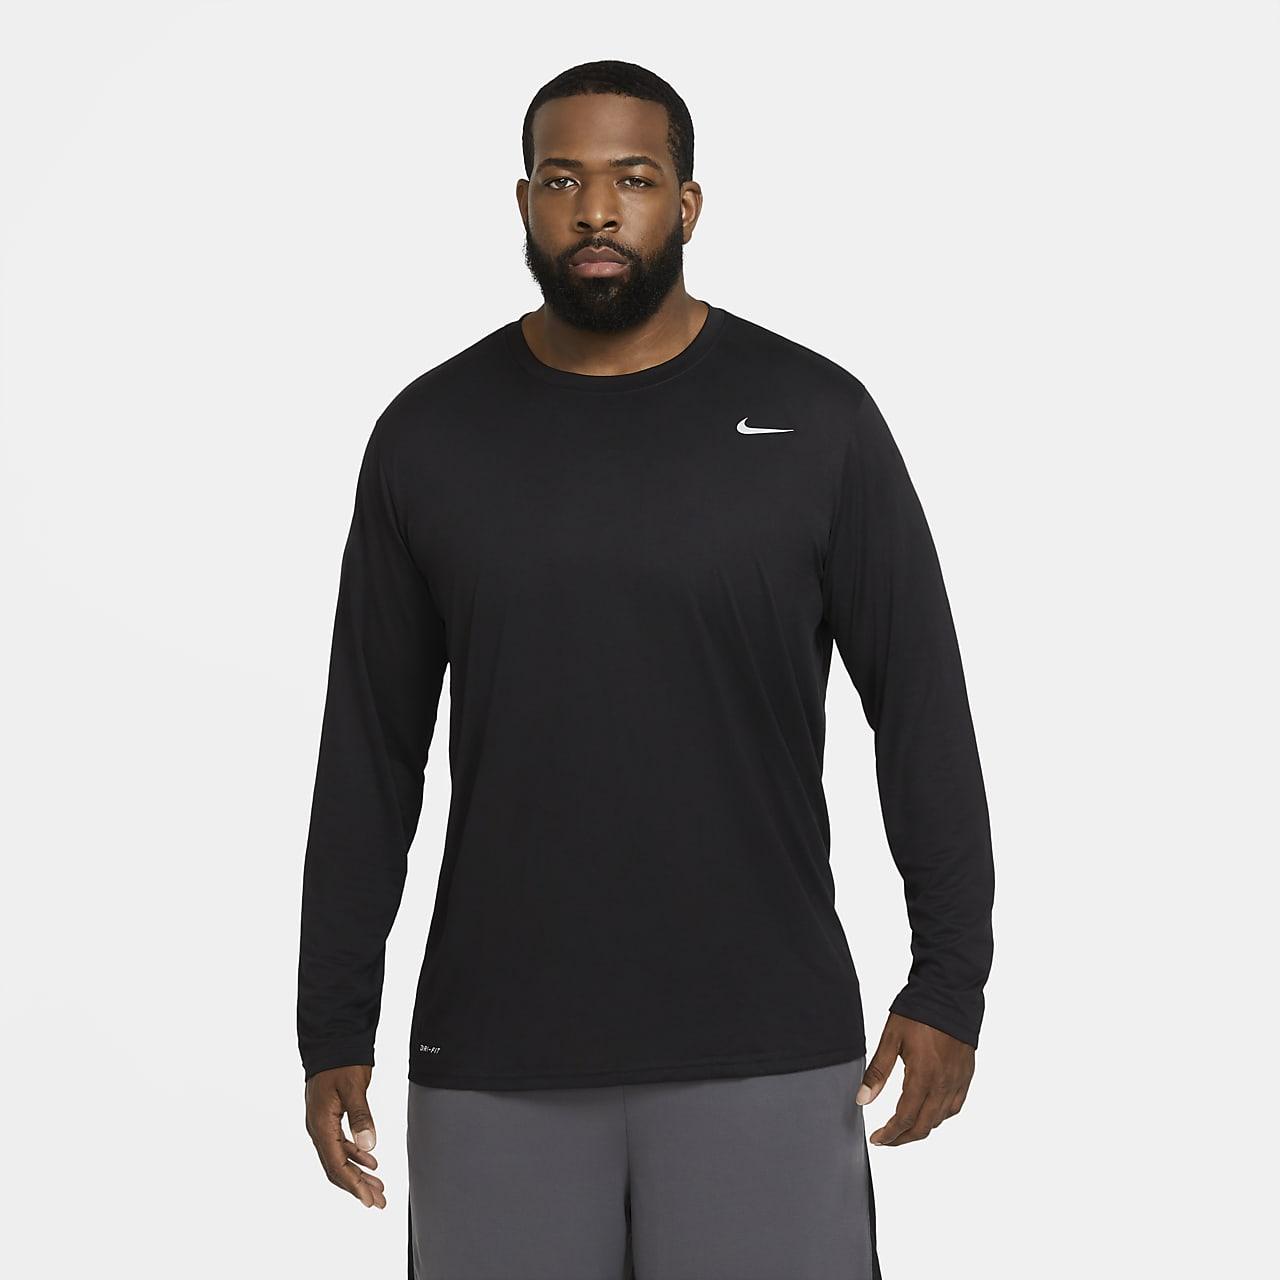 2799aeedfd29 Nike Dri-FIT Legend 2.0 Men s Long-Sleeve Training Top. Nike.com